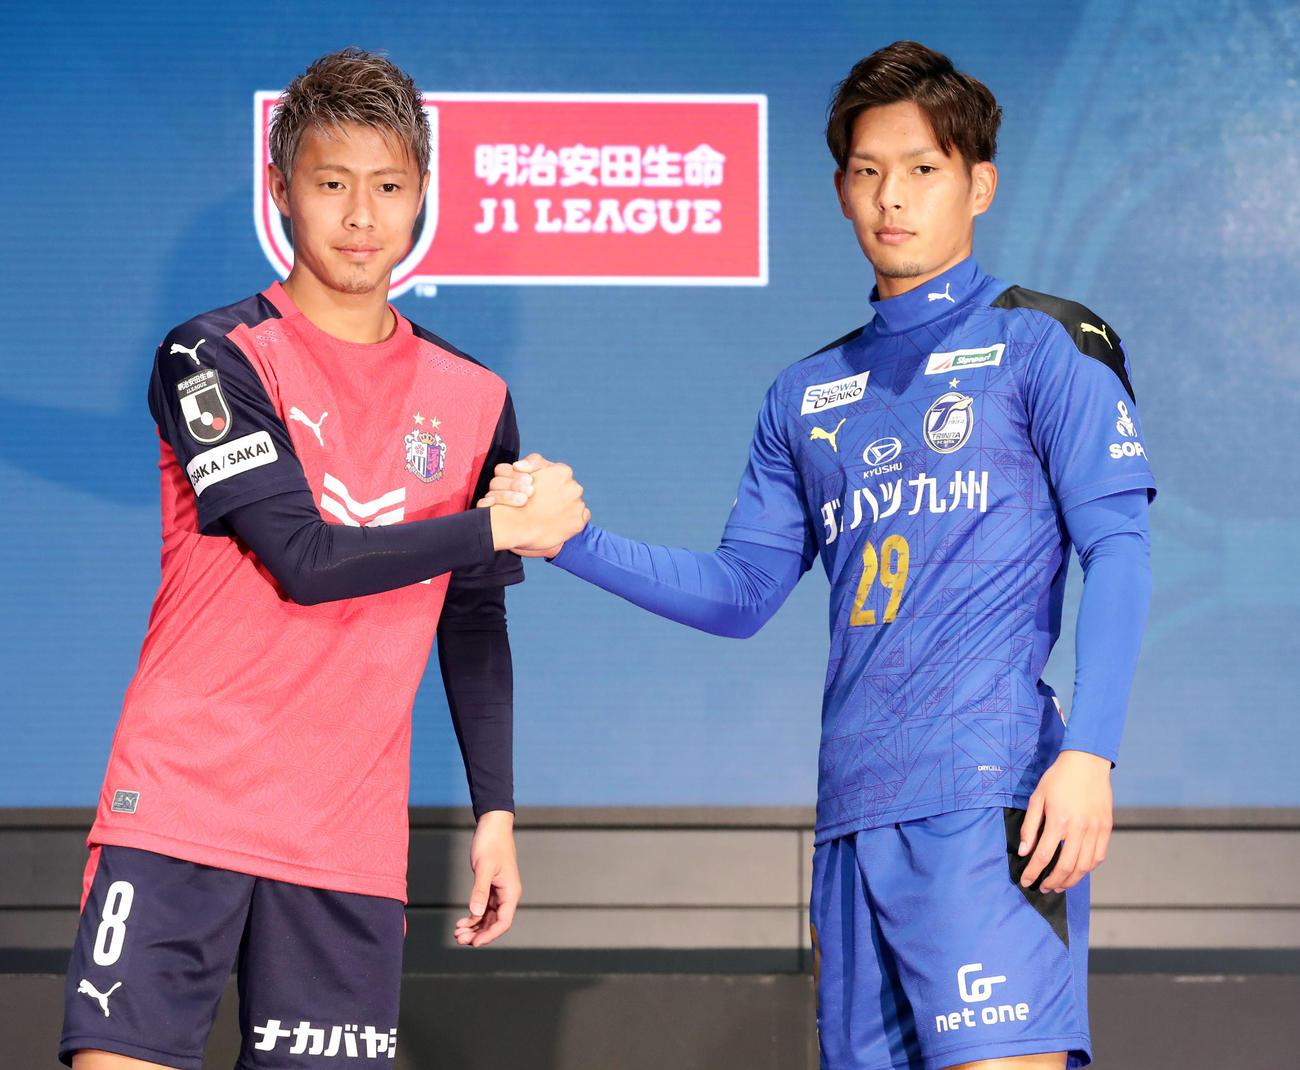 2020Jリーグキックオフカンファレンスで開幕カードのC大阪FW柿谷(左)と大分DF岩田は握手(撮影・浅見桂子)